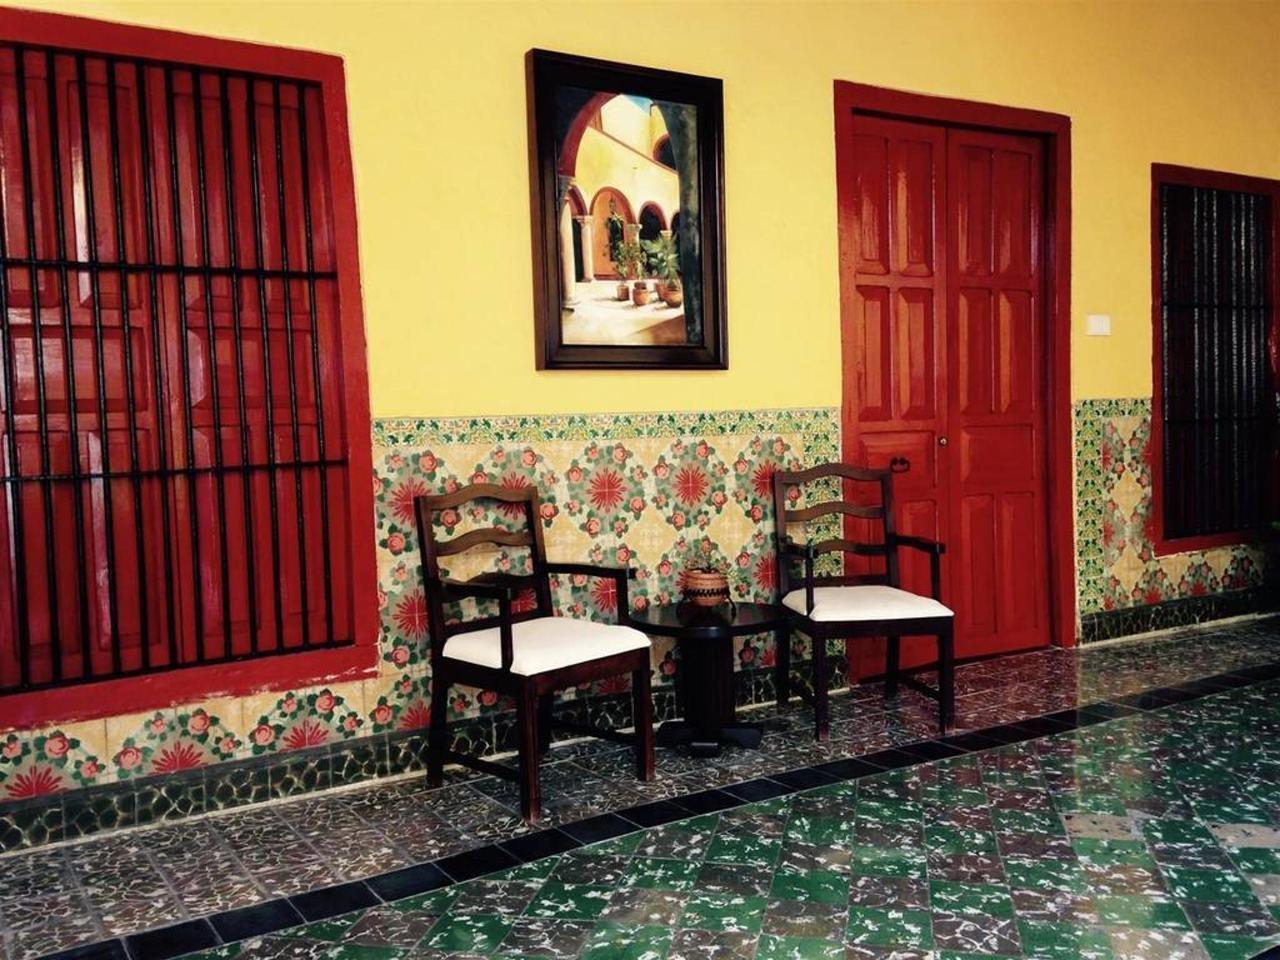 Chairs in corridor at Hotel Castelmar Campeche